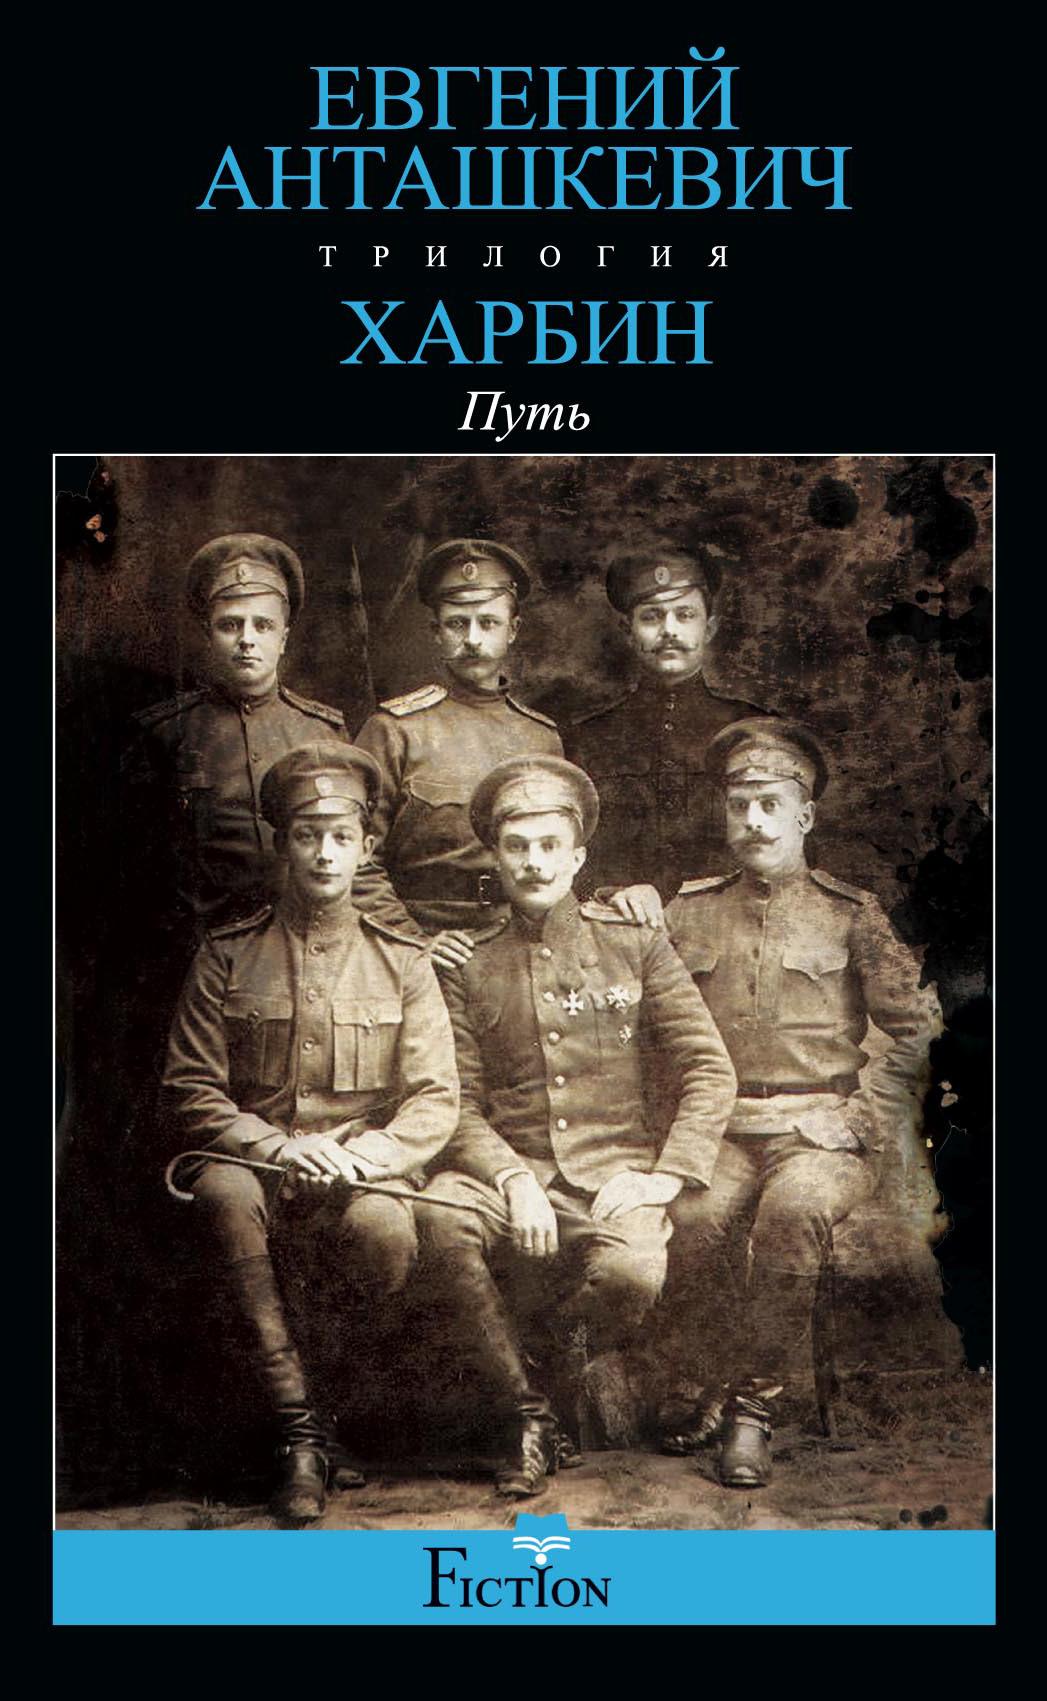 Евгений Анташкевич «Харбин. Книга 1. Путь»